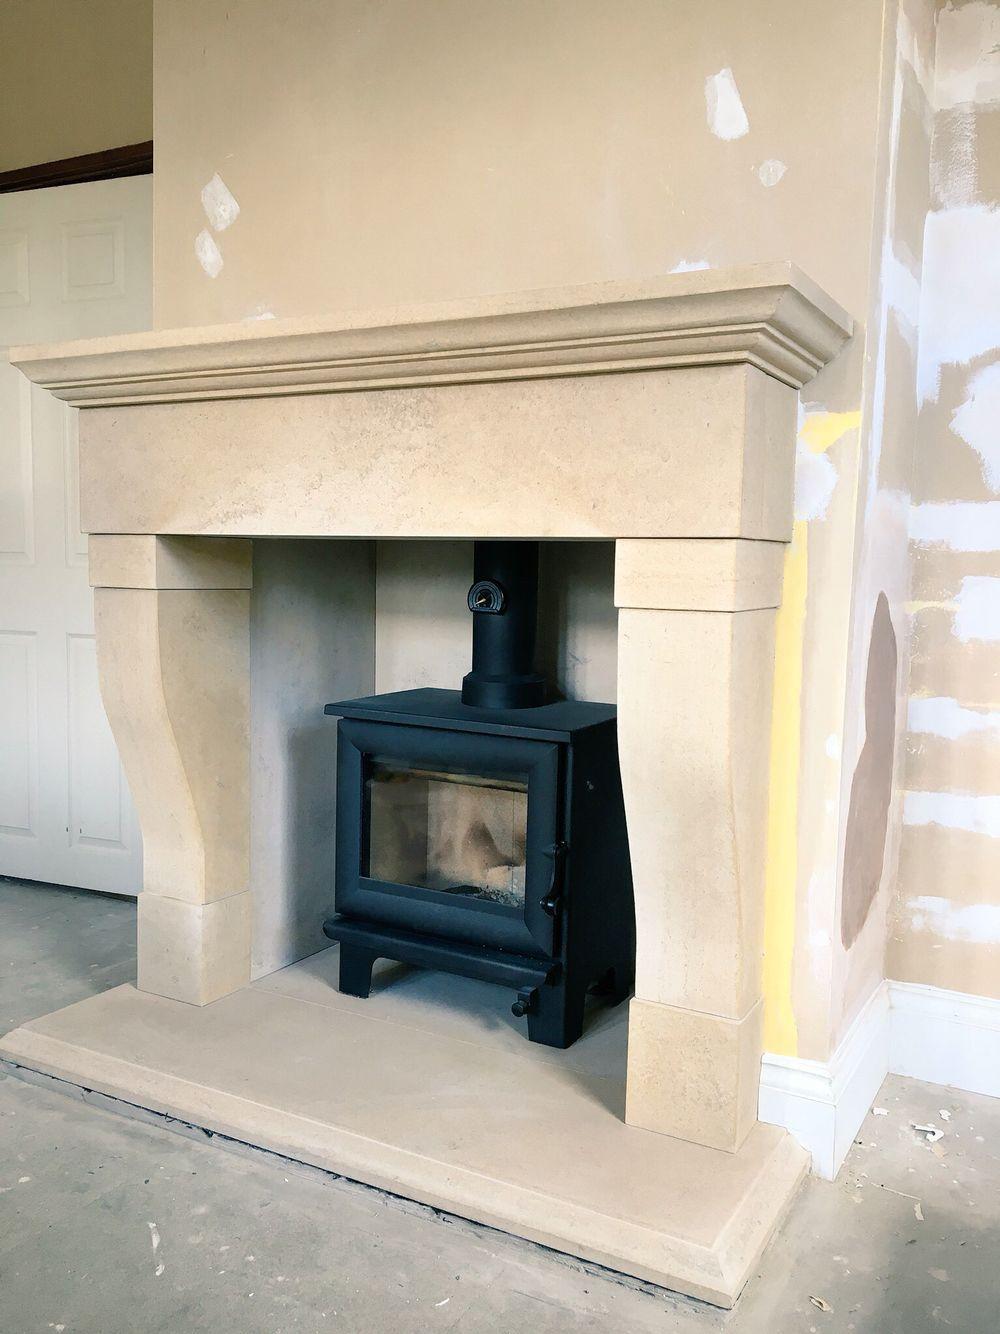 Wood Burning Stove And Yorkshire Stone Fireplace We Designed And